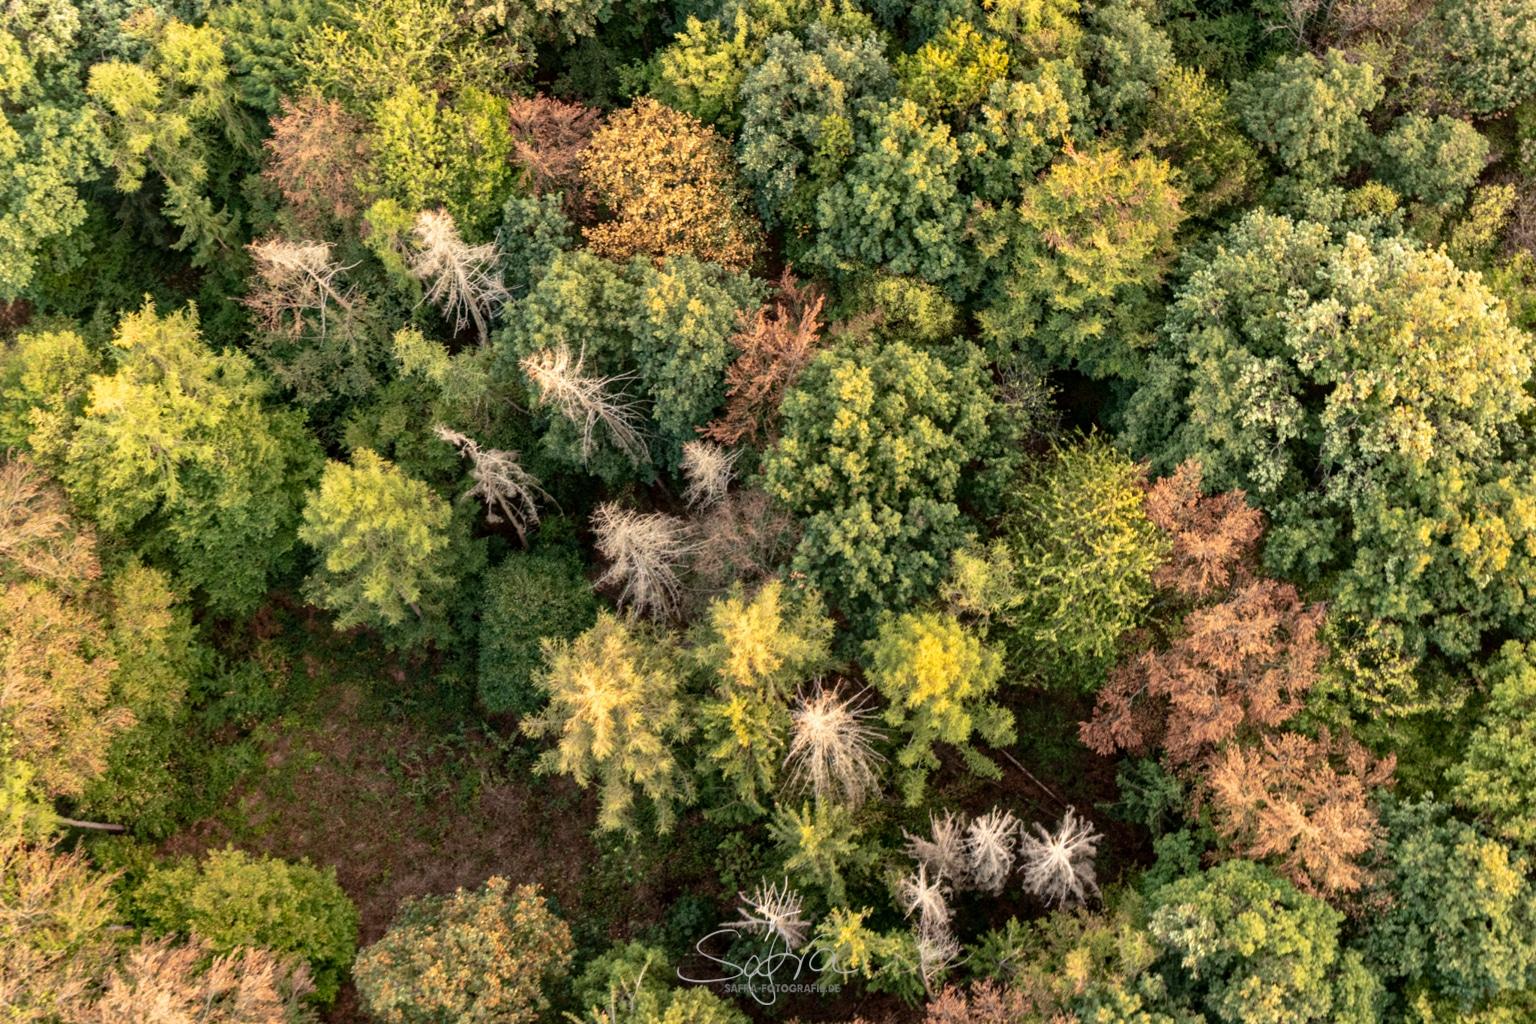 Heißluftballonfahrt, Waldsterben